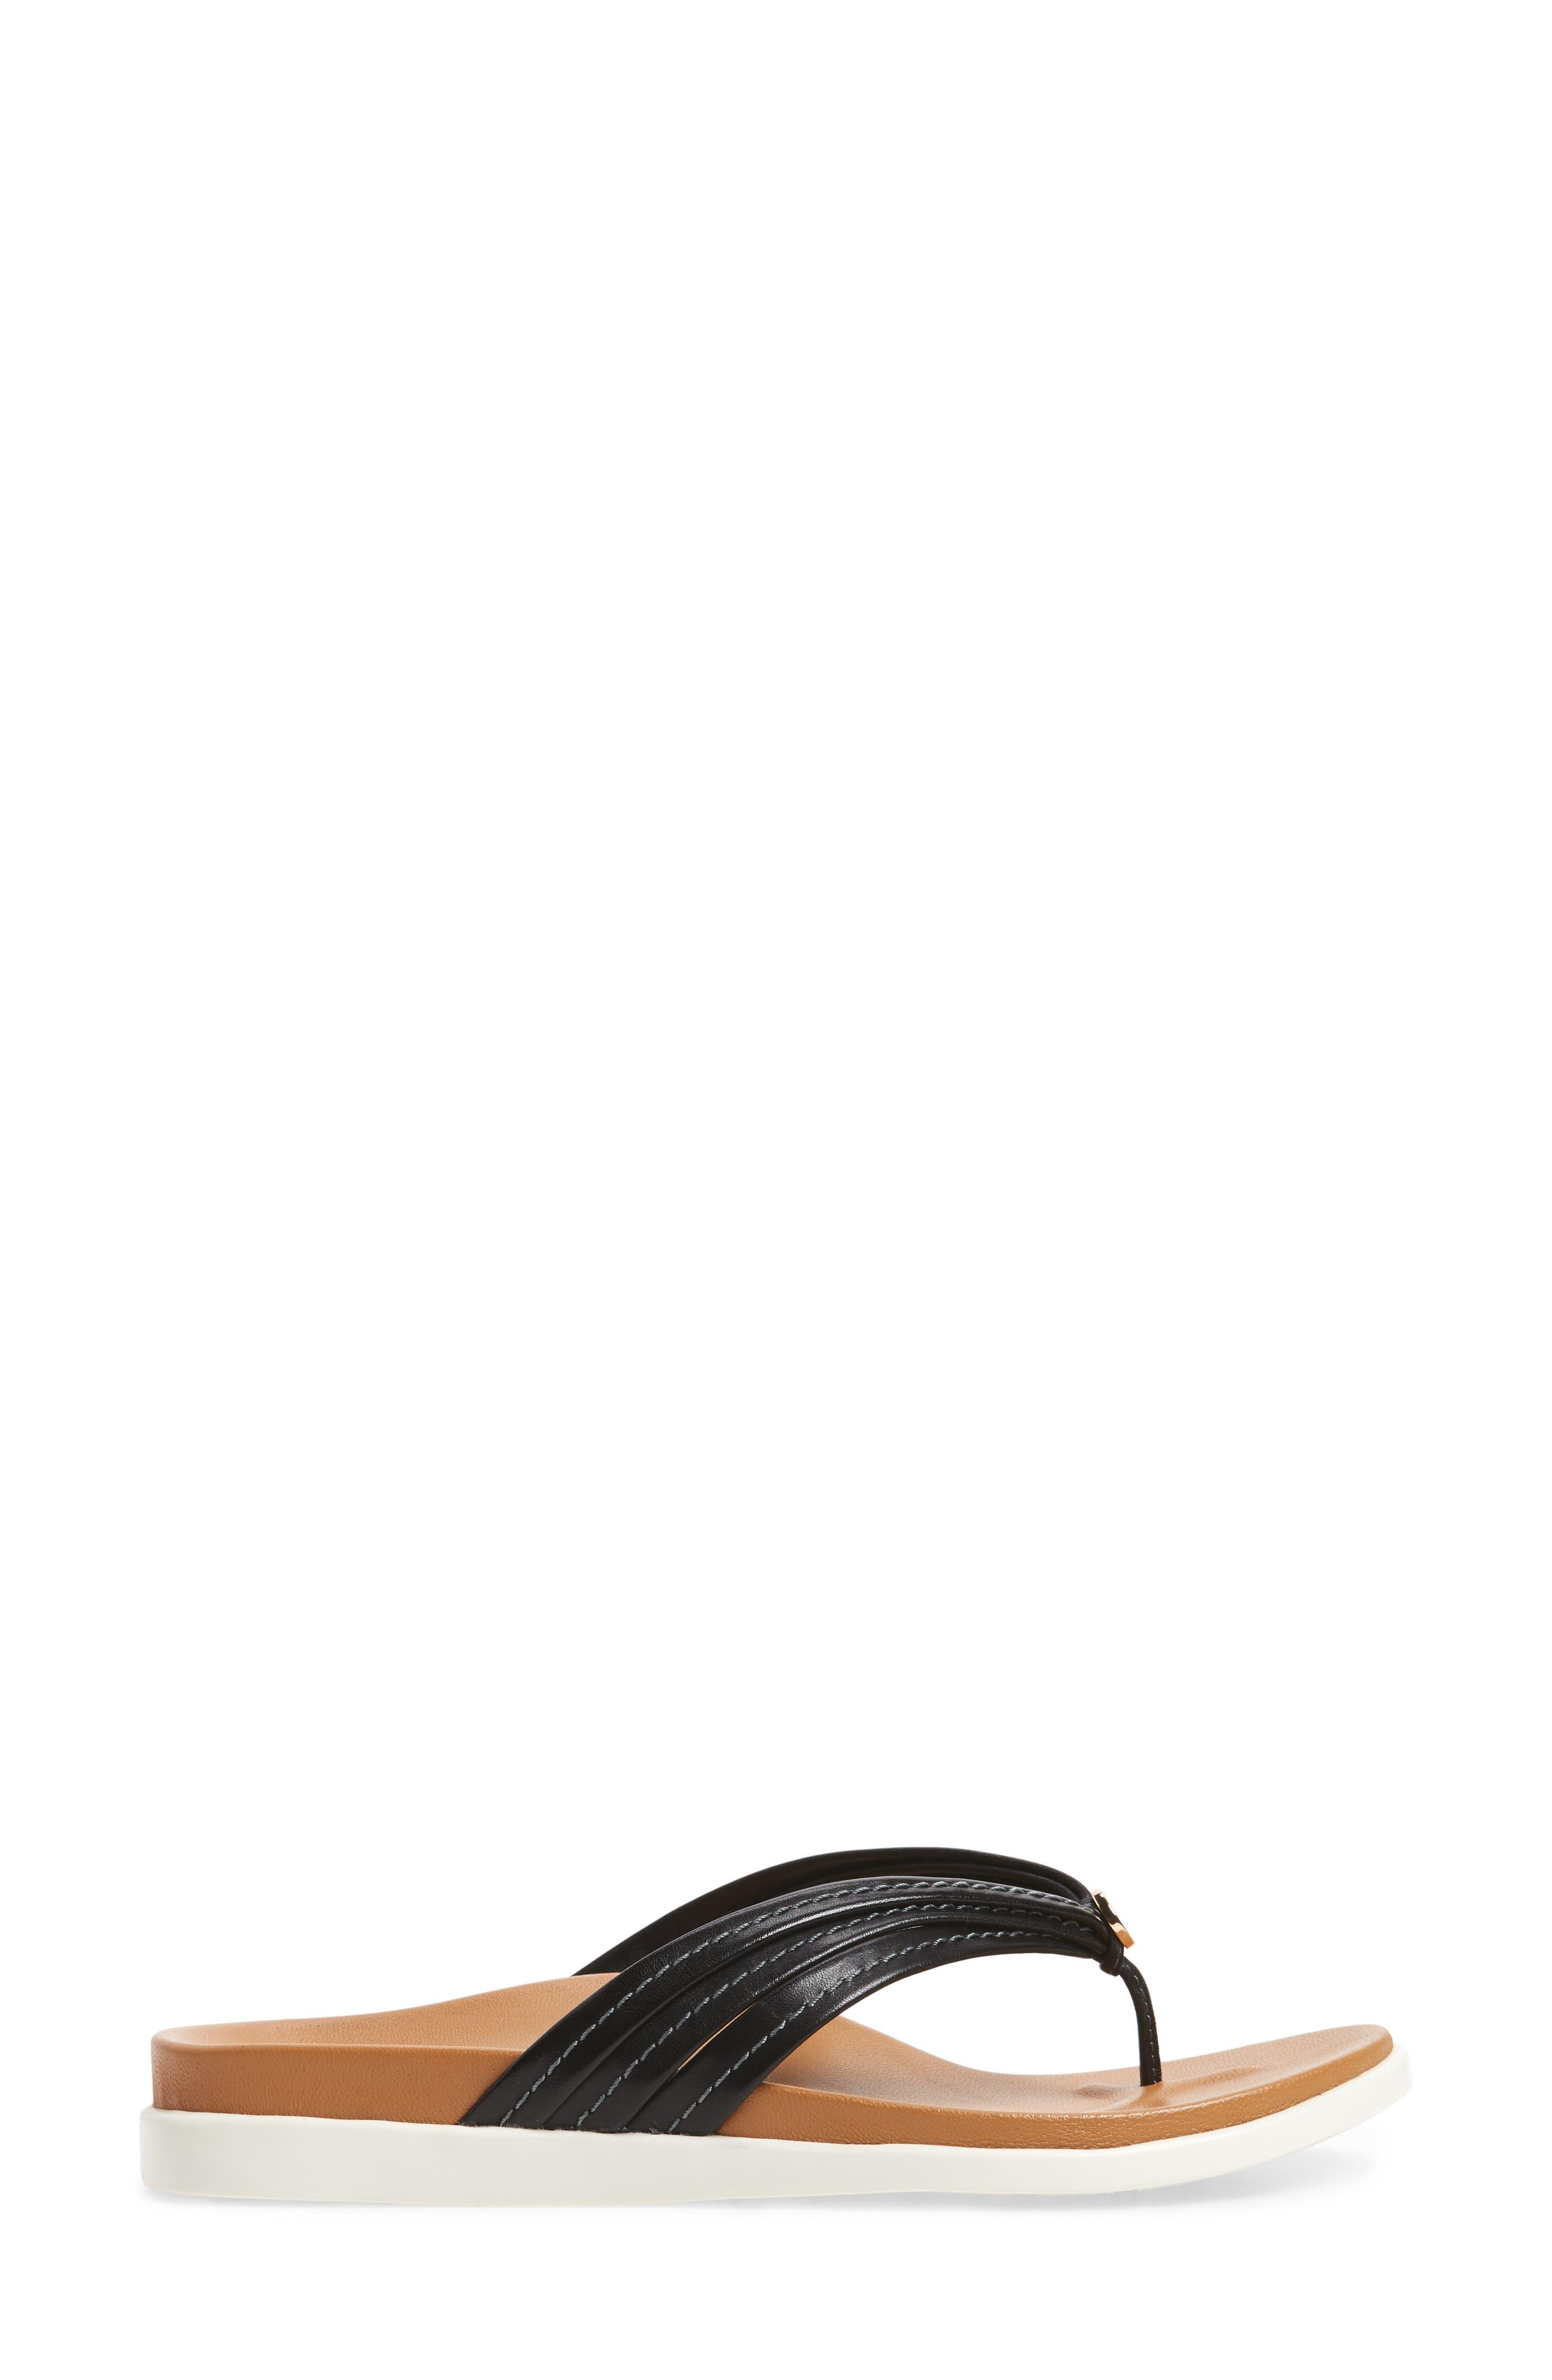 Catalina Flip Flop,                             Alternate thumbnail 3, color,                             BLACK LEATHER